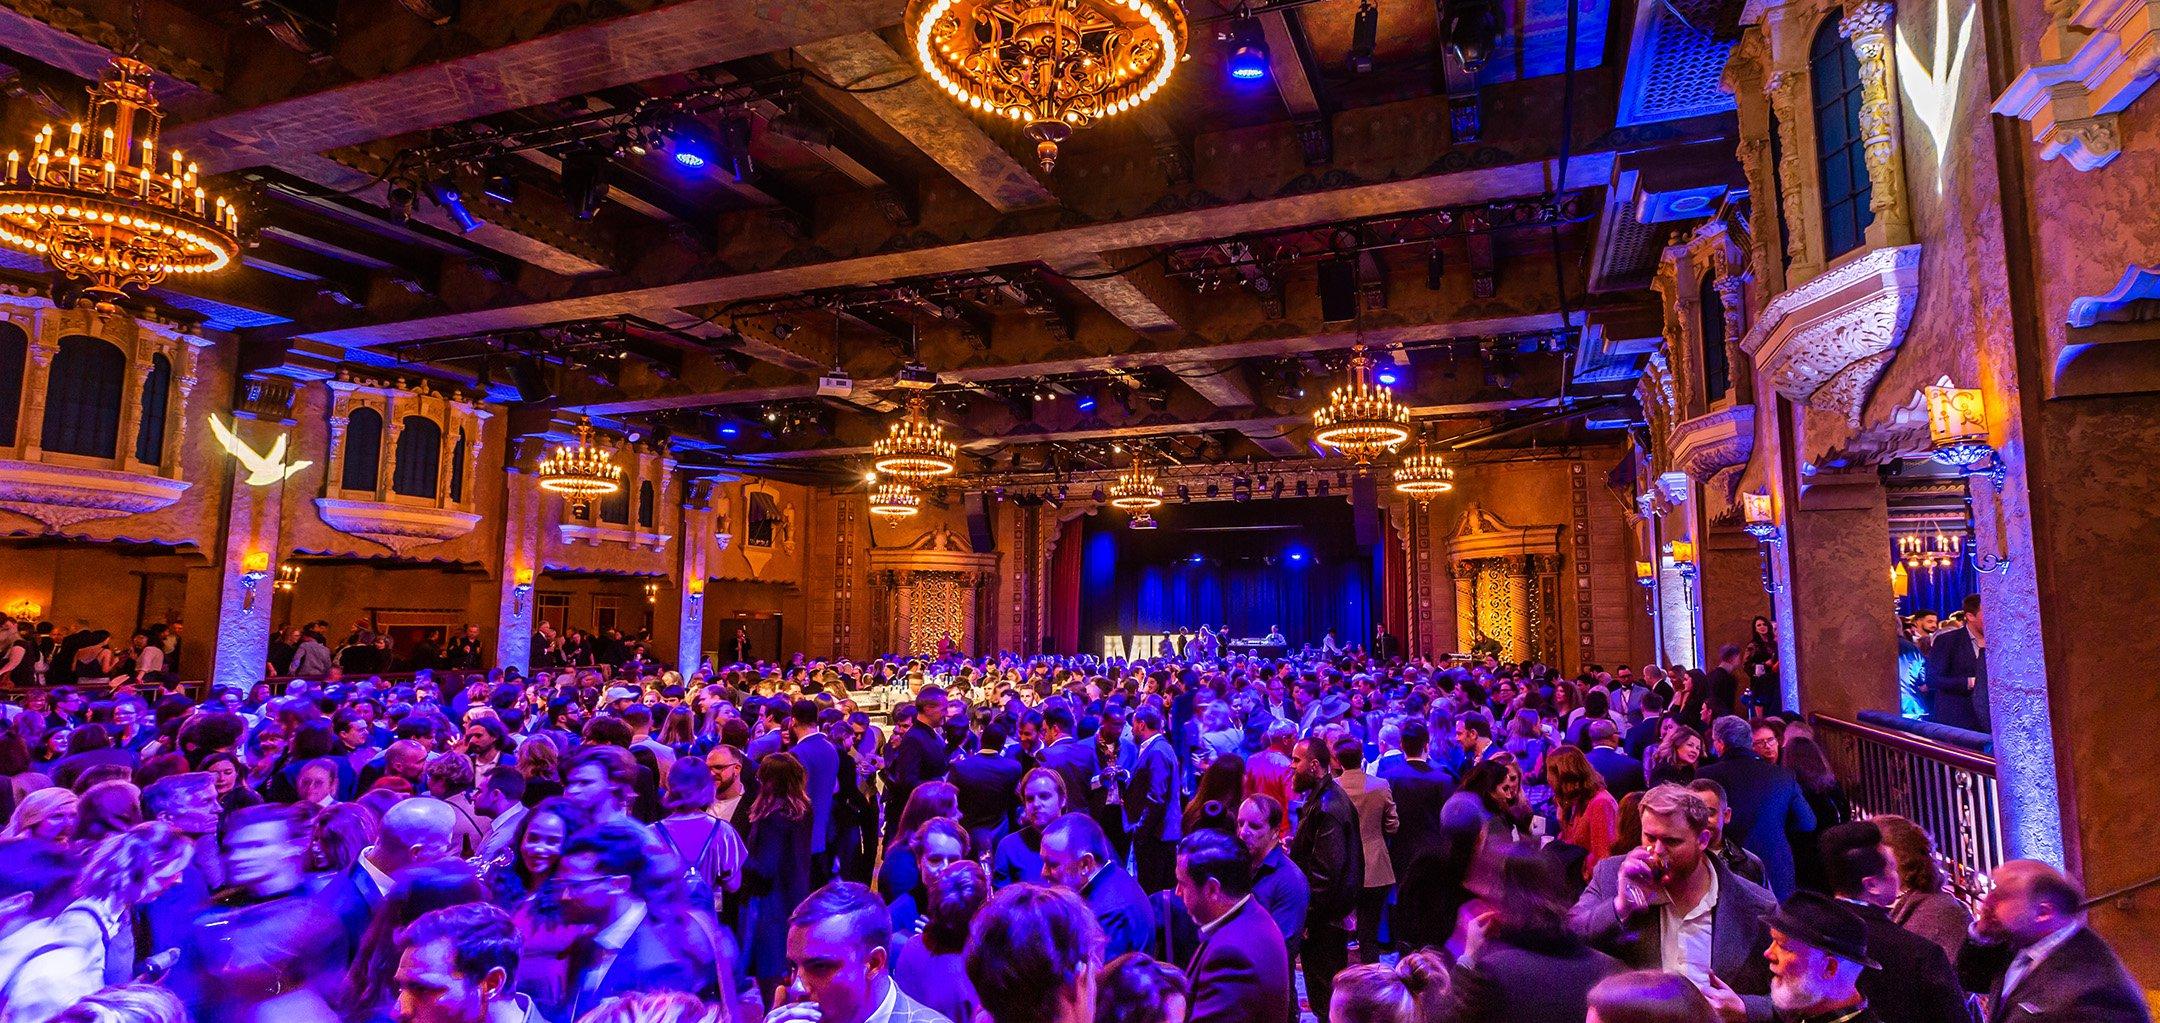 MIFF 2018 opening night gala